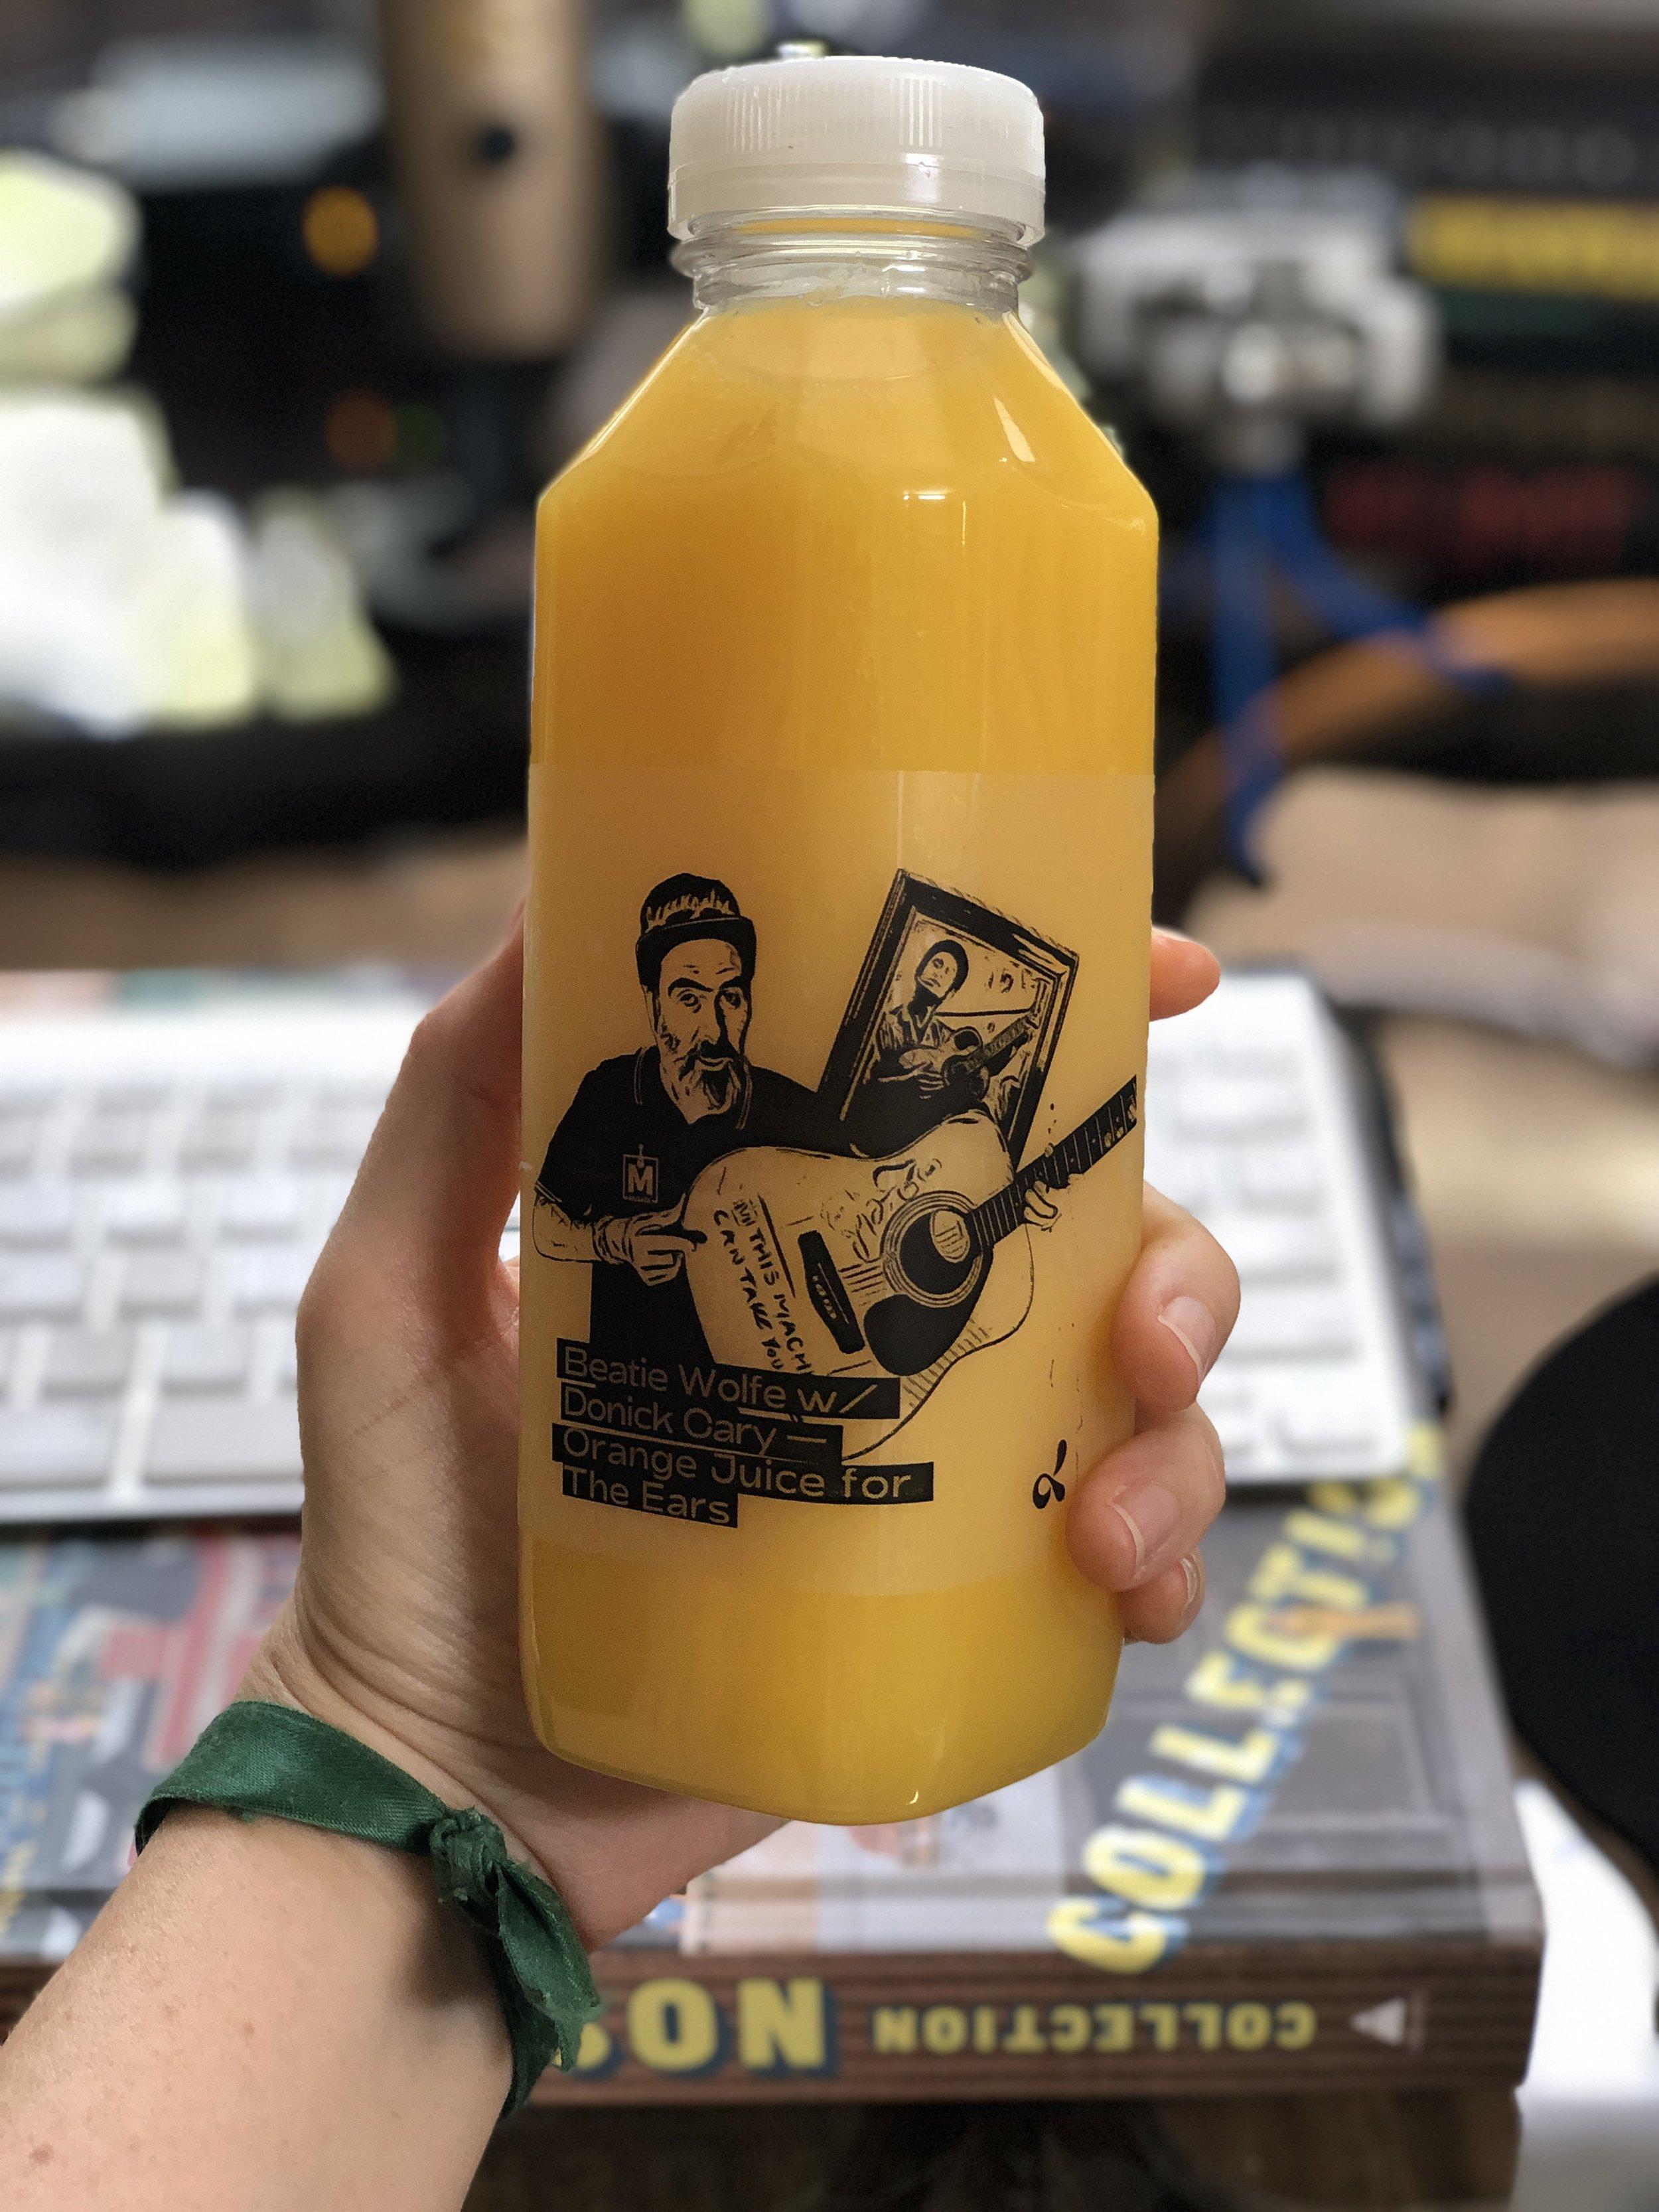 Donick Cary on Orange Juice bottle on Beatie Wolfe's Orange Juice for the Ears dublab radio show